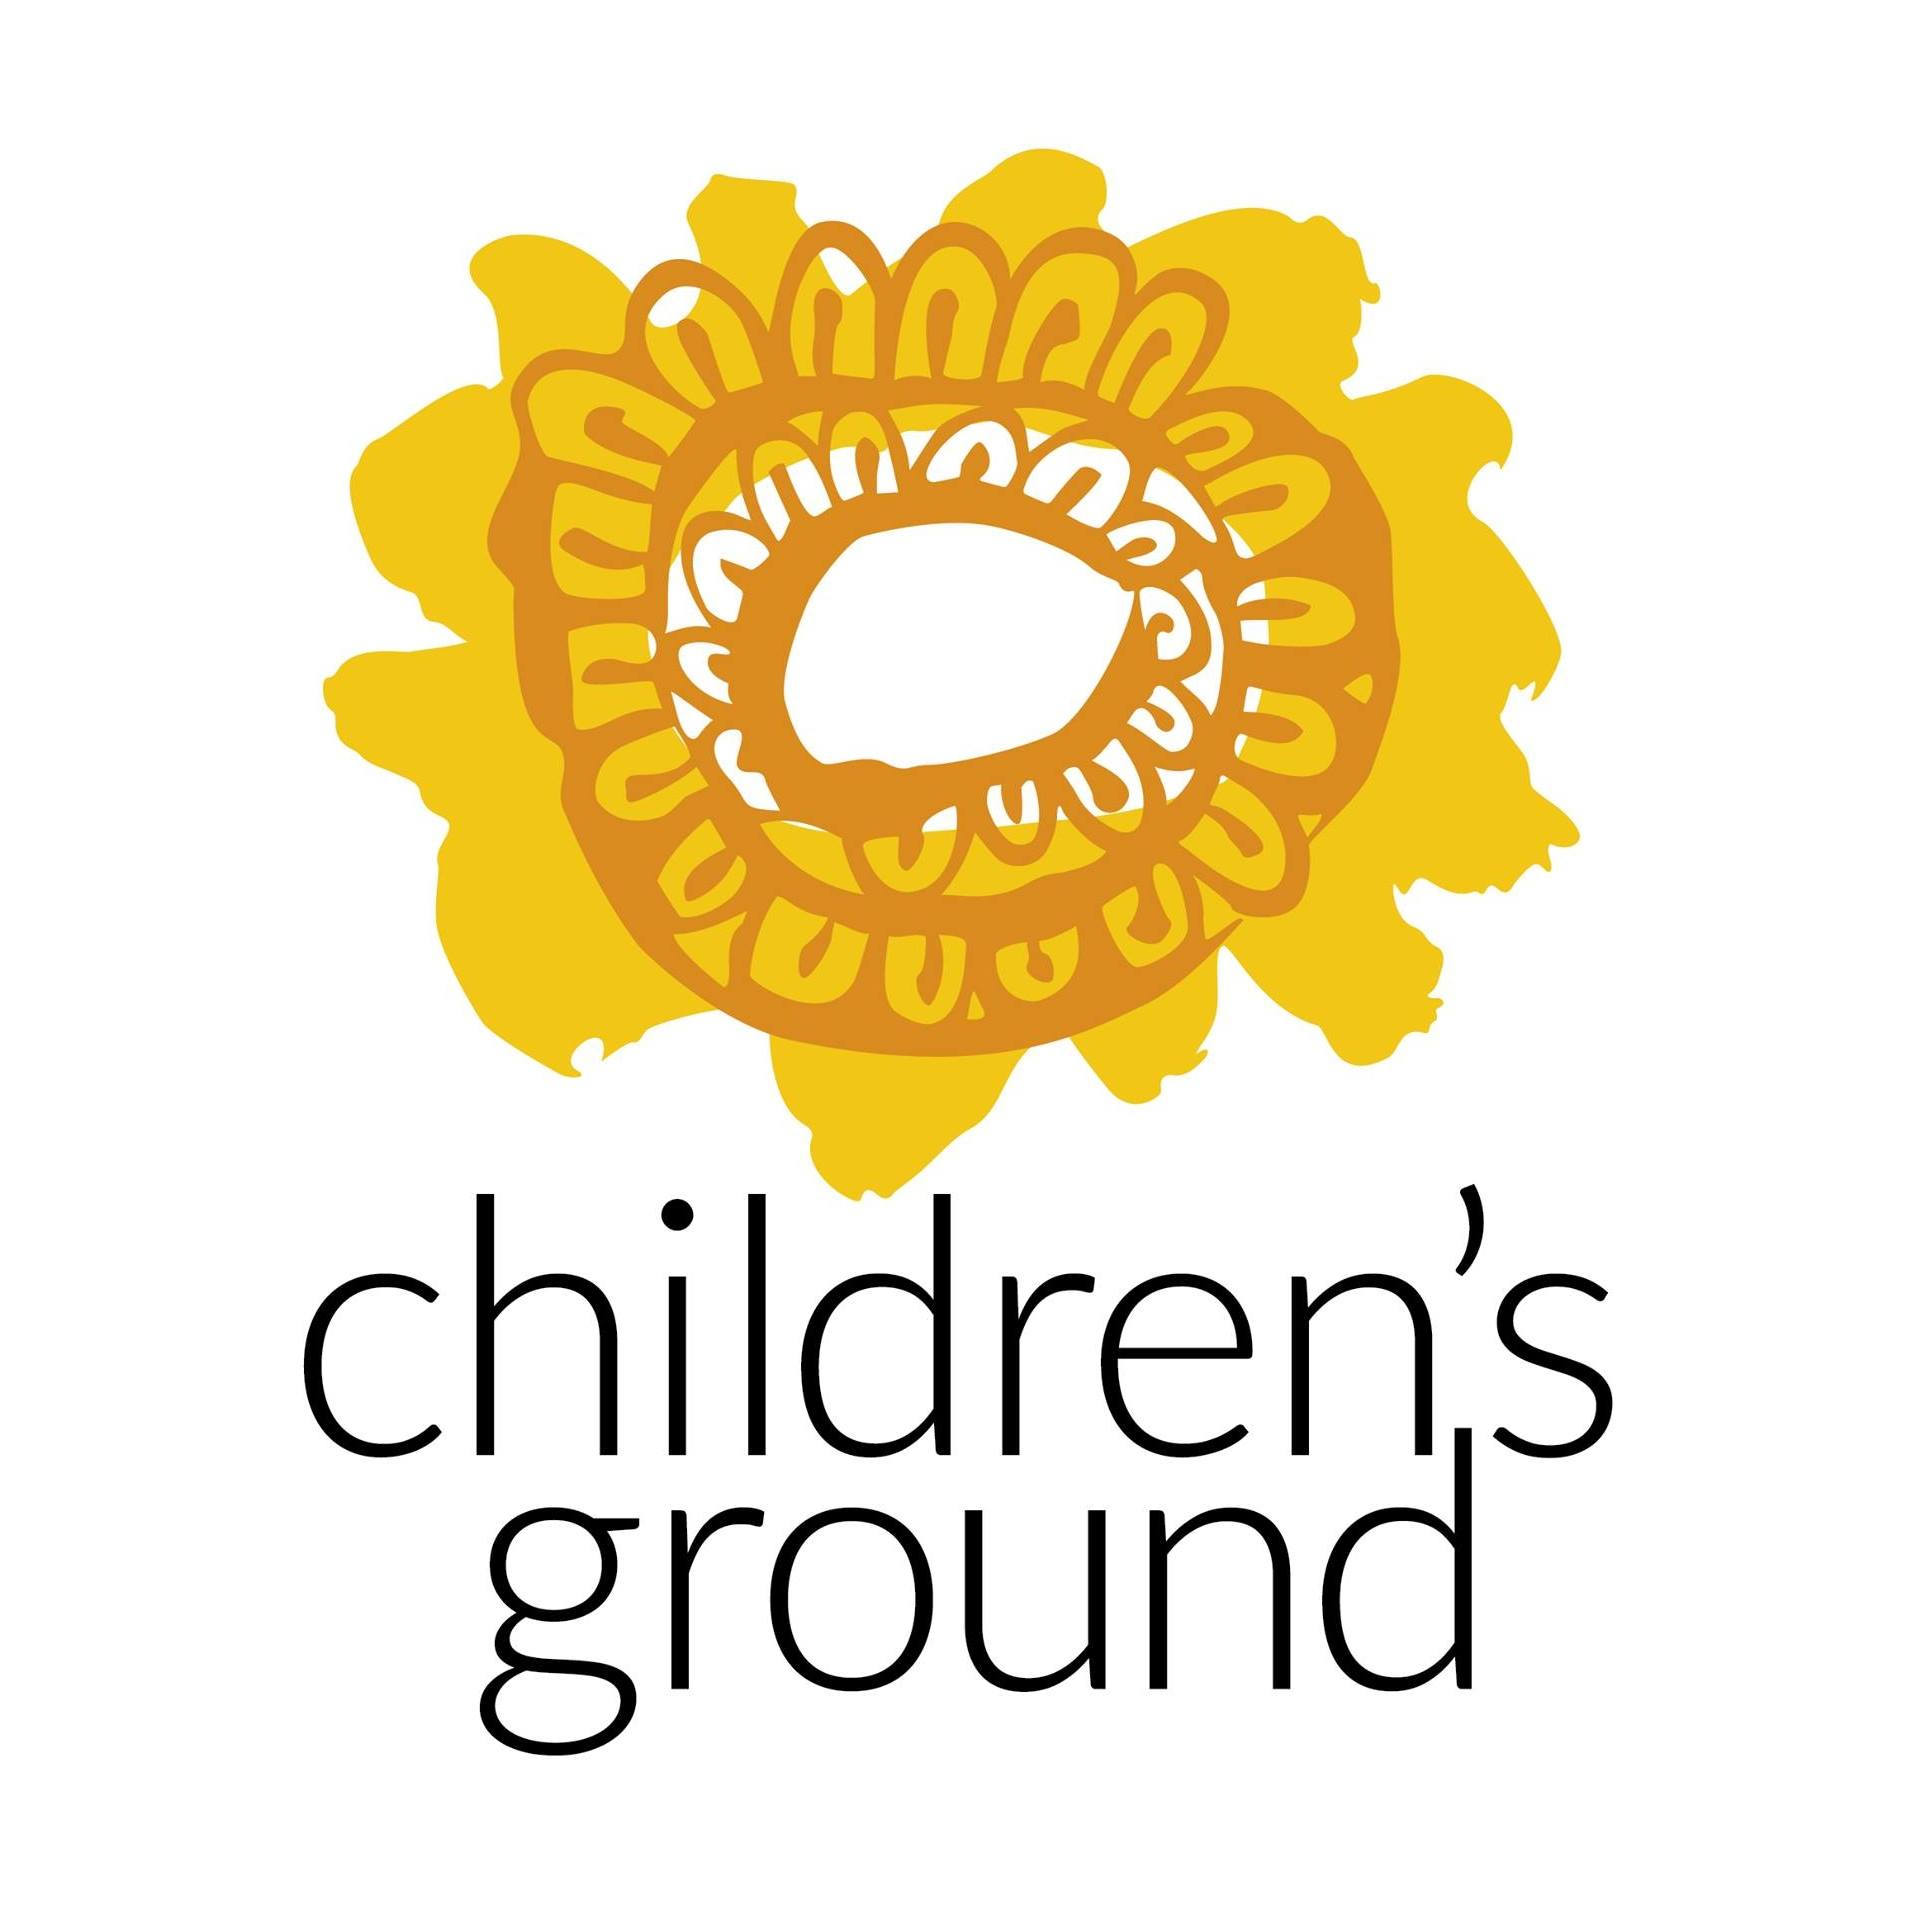 https://www.charterforcompassion.com.au/wp-content/uploads/2020/10/childrens-ground.jpg